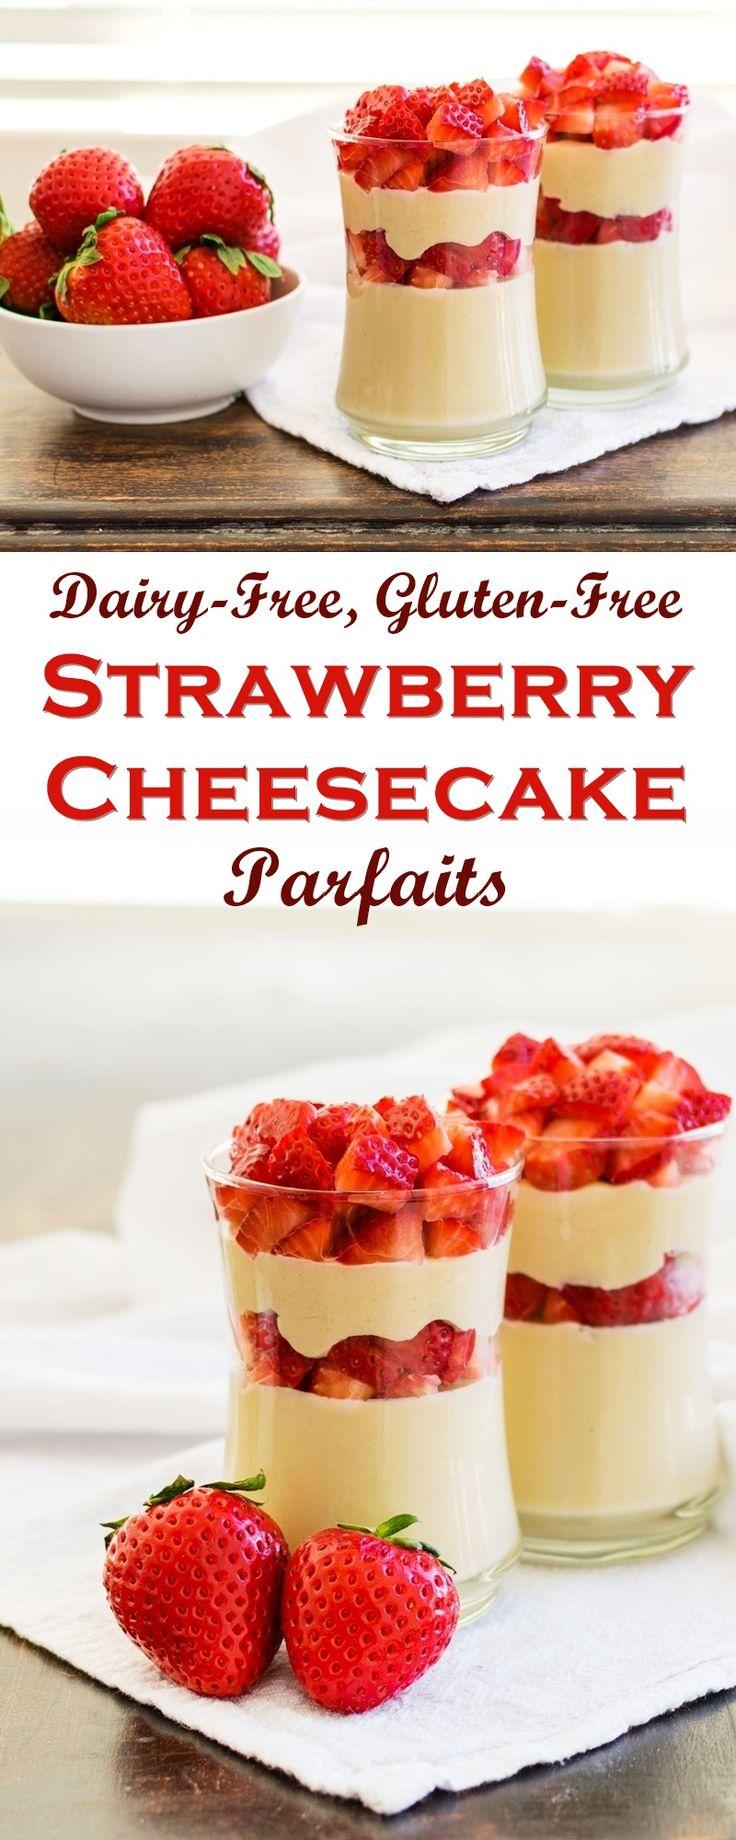 Dairy-Free Strawberry Cheesecake Parfaits Recipe - healthy, creamy, indulgent, gluten-free, vegan, and easy!